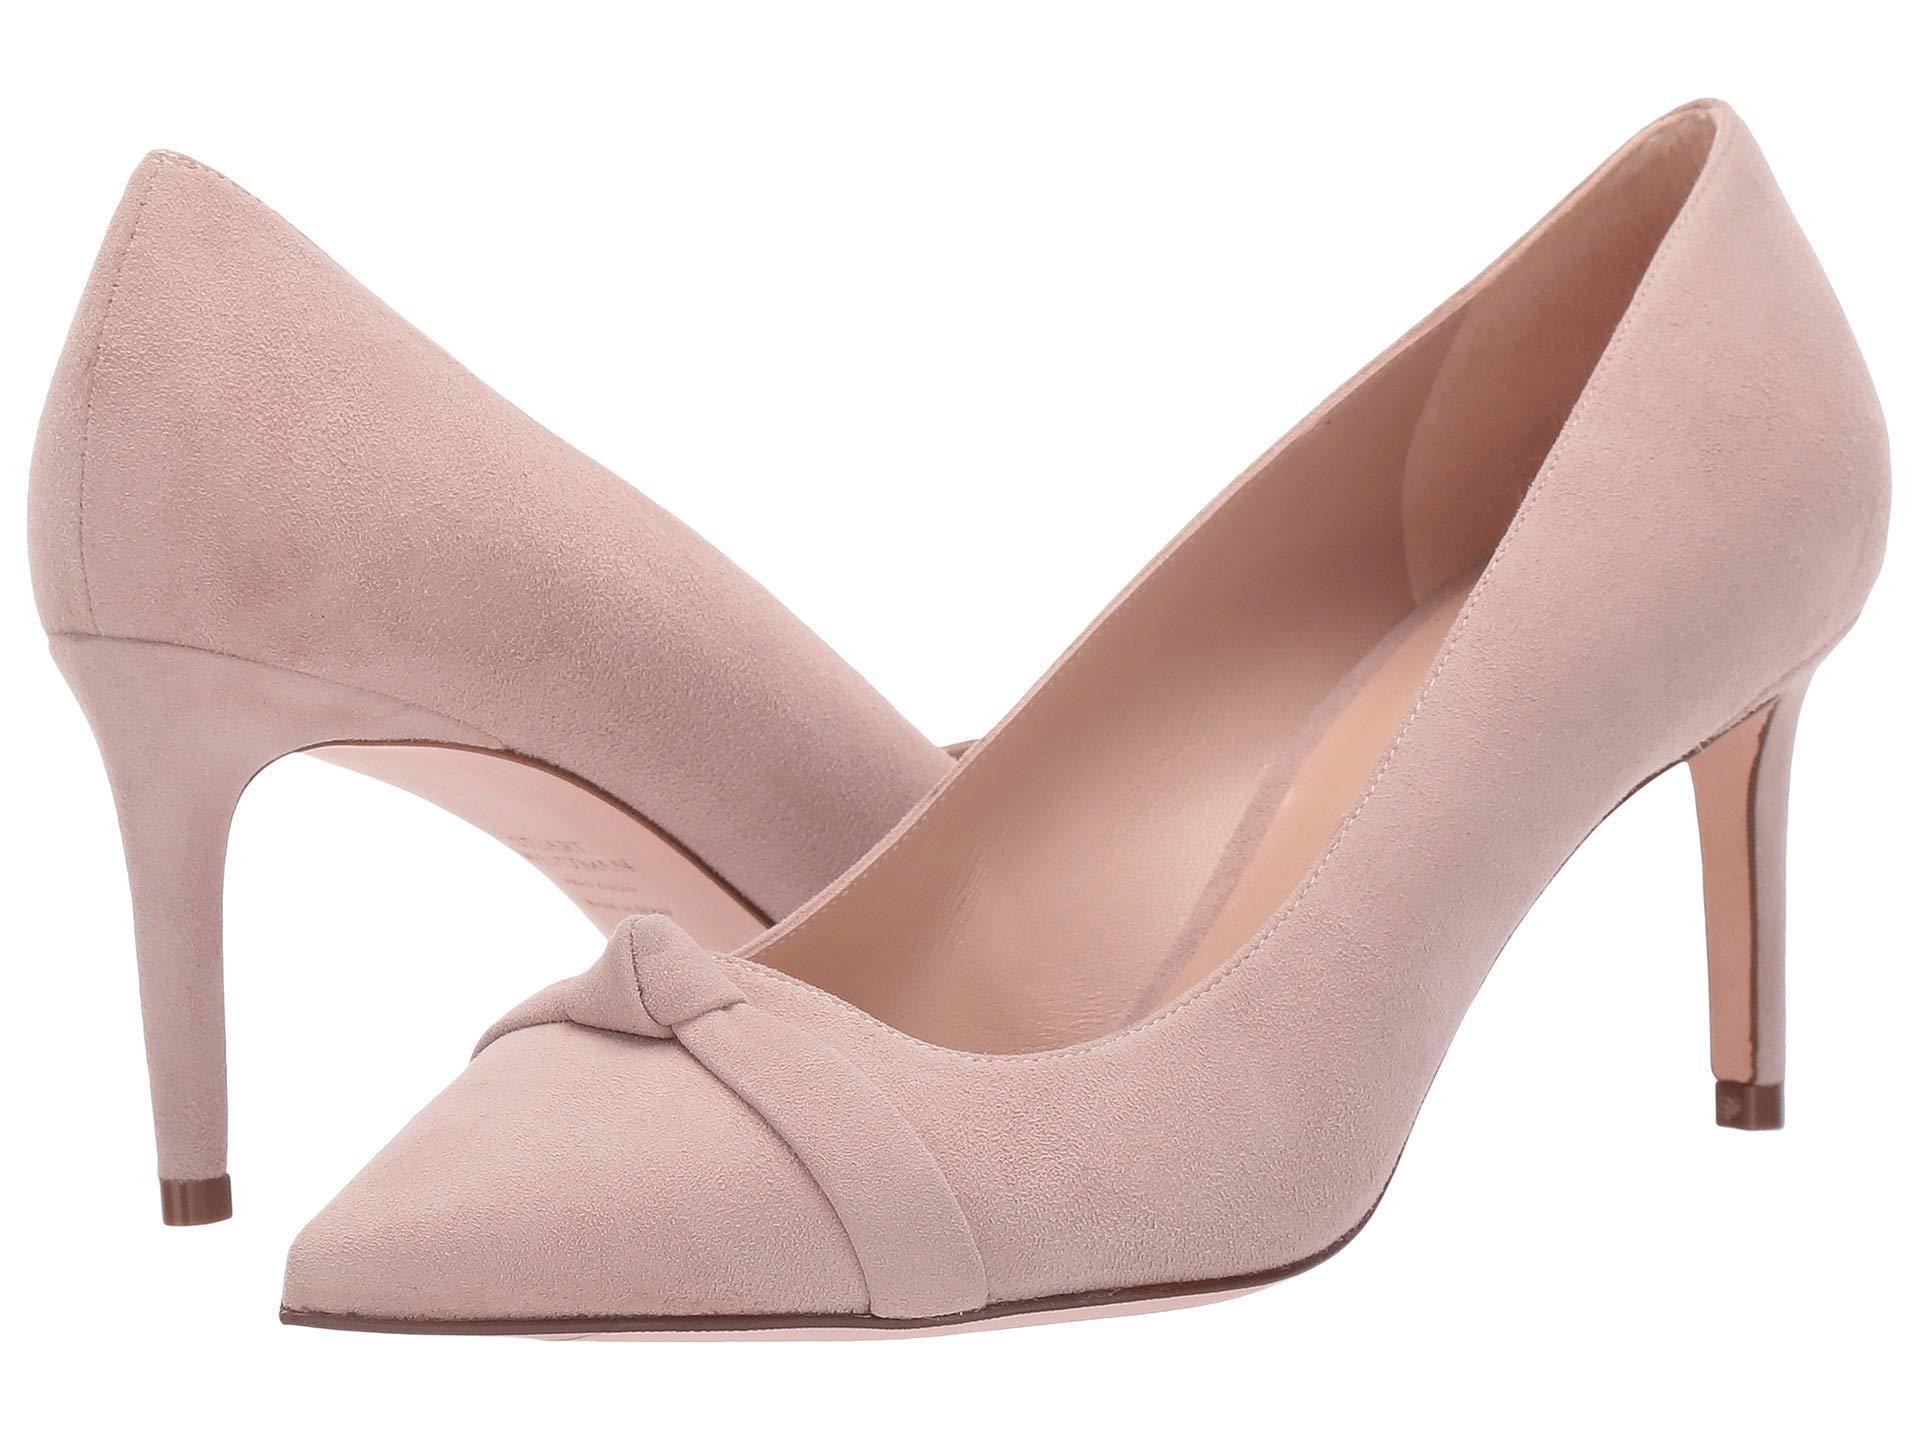 54b727718 Stuart Weitzman Fontaine (black Suede) Women's Shoes in Pink - Lyst